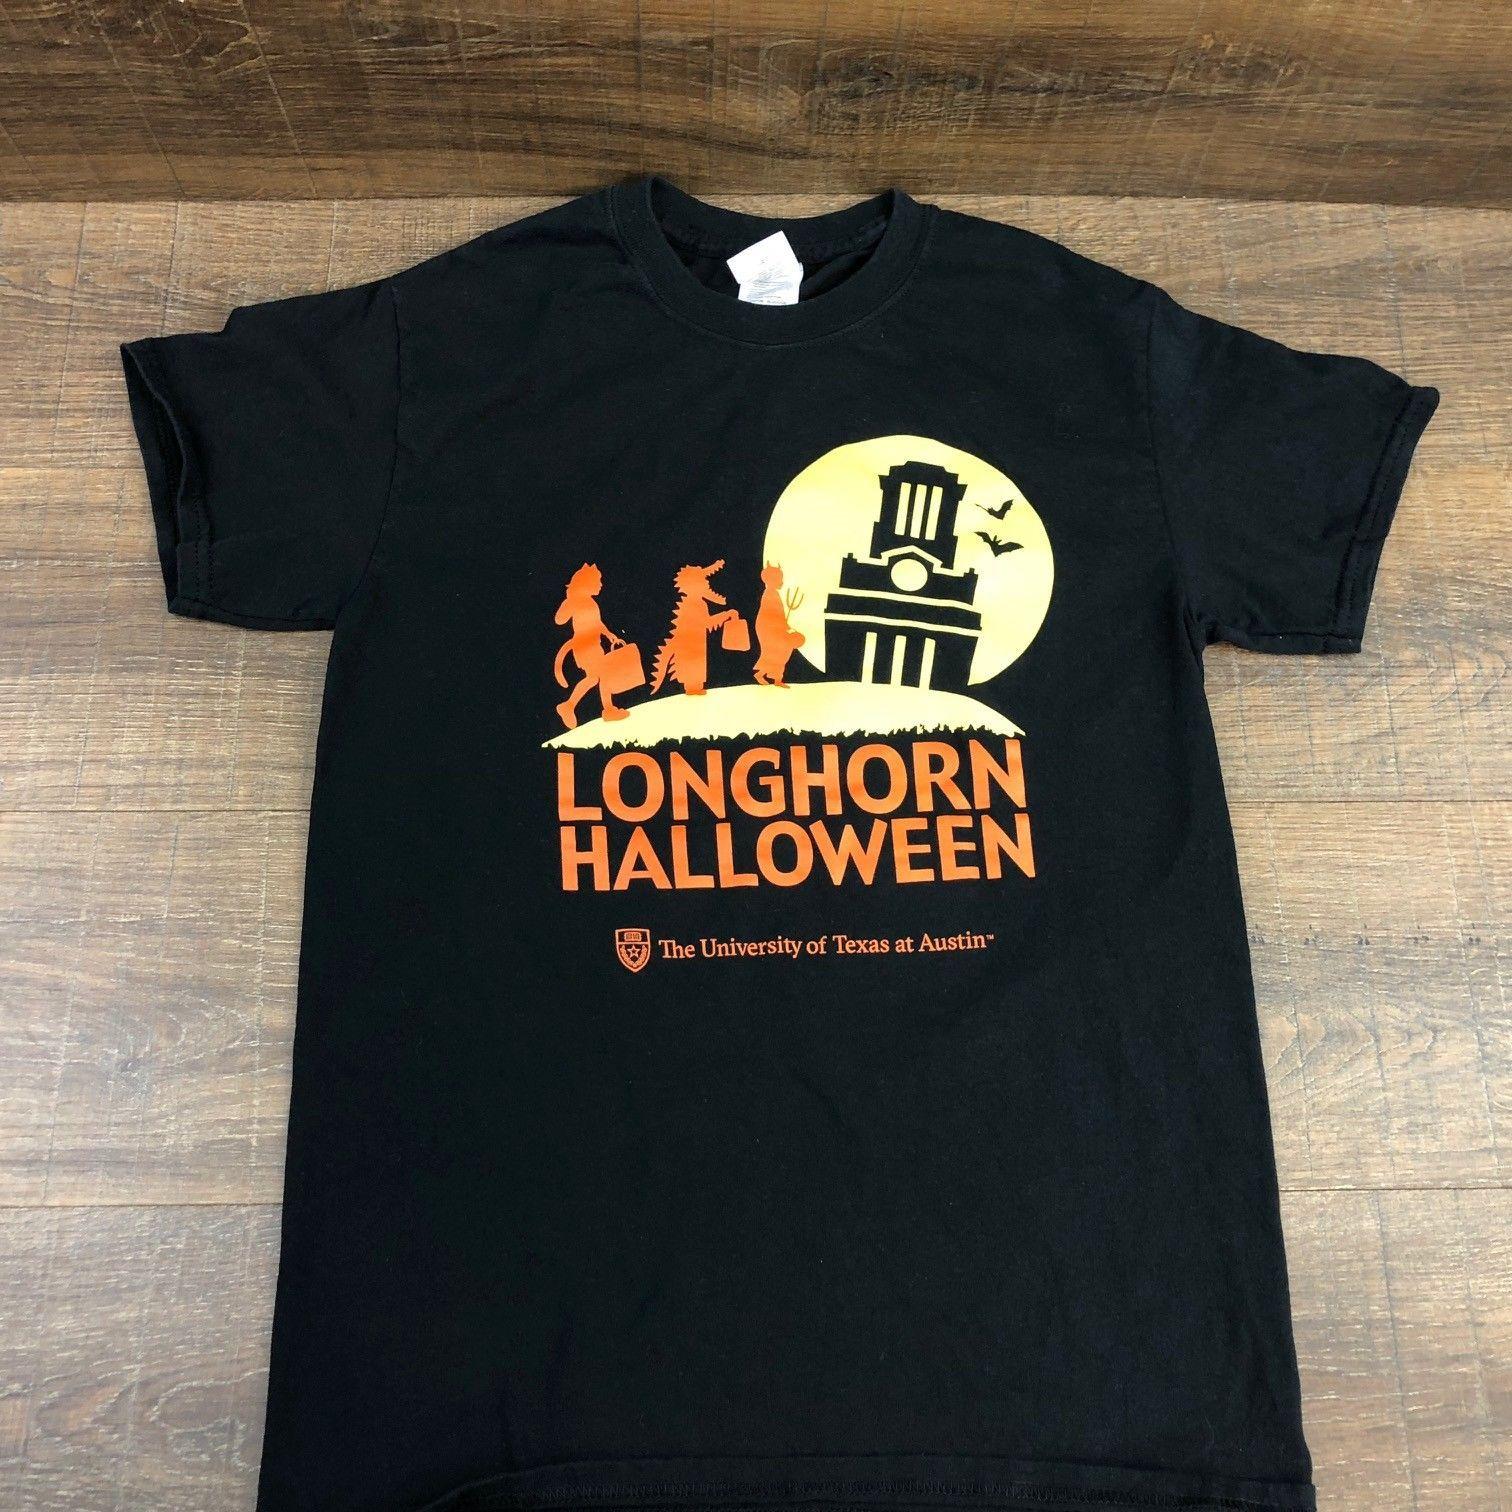 b1af745857a9c2 Longhorn Halloween Men's T-Shirt 386-9 University of Texas at Austin Black  Small Men's Clothing T-Shirts Short Sleeve Male